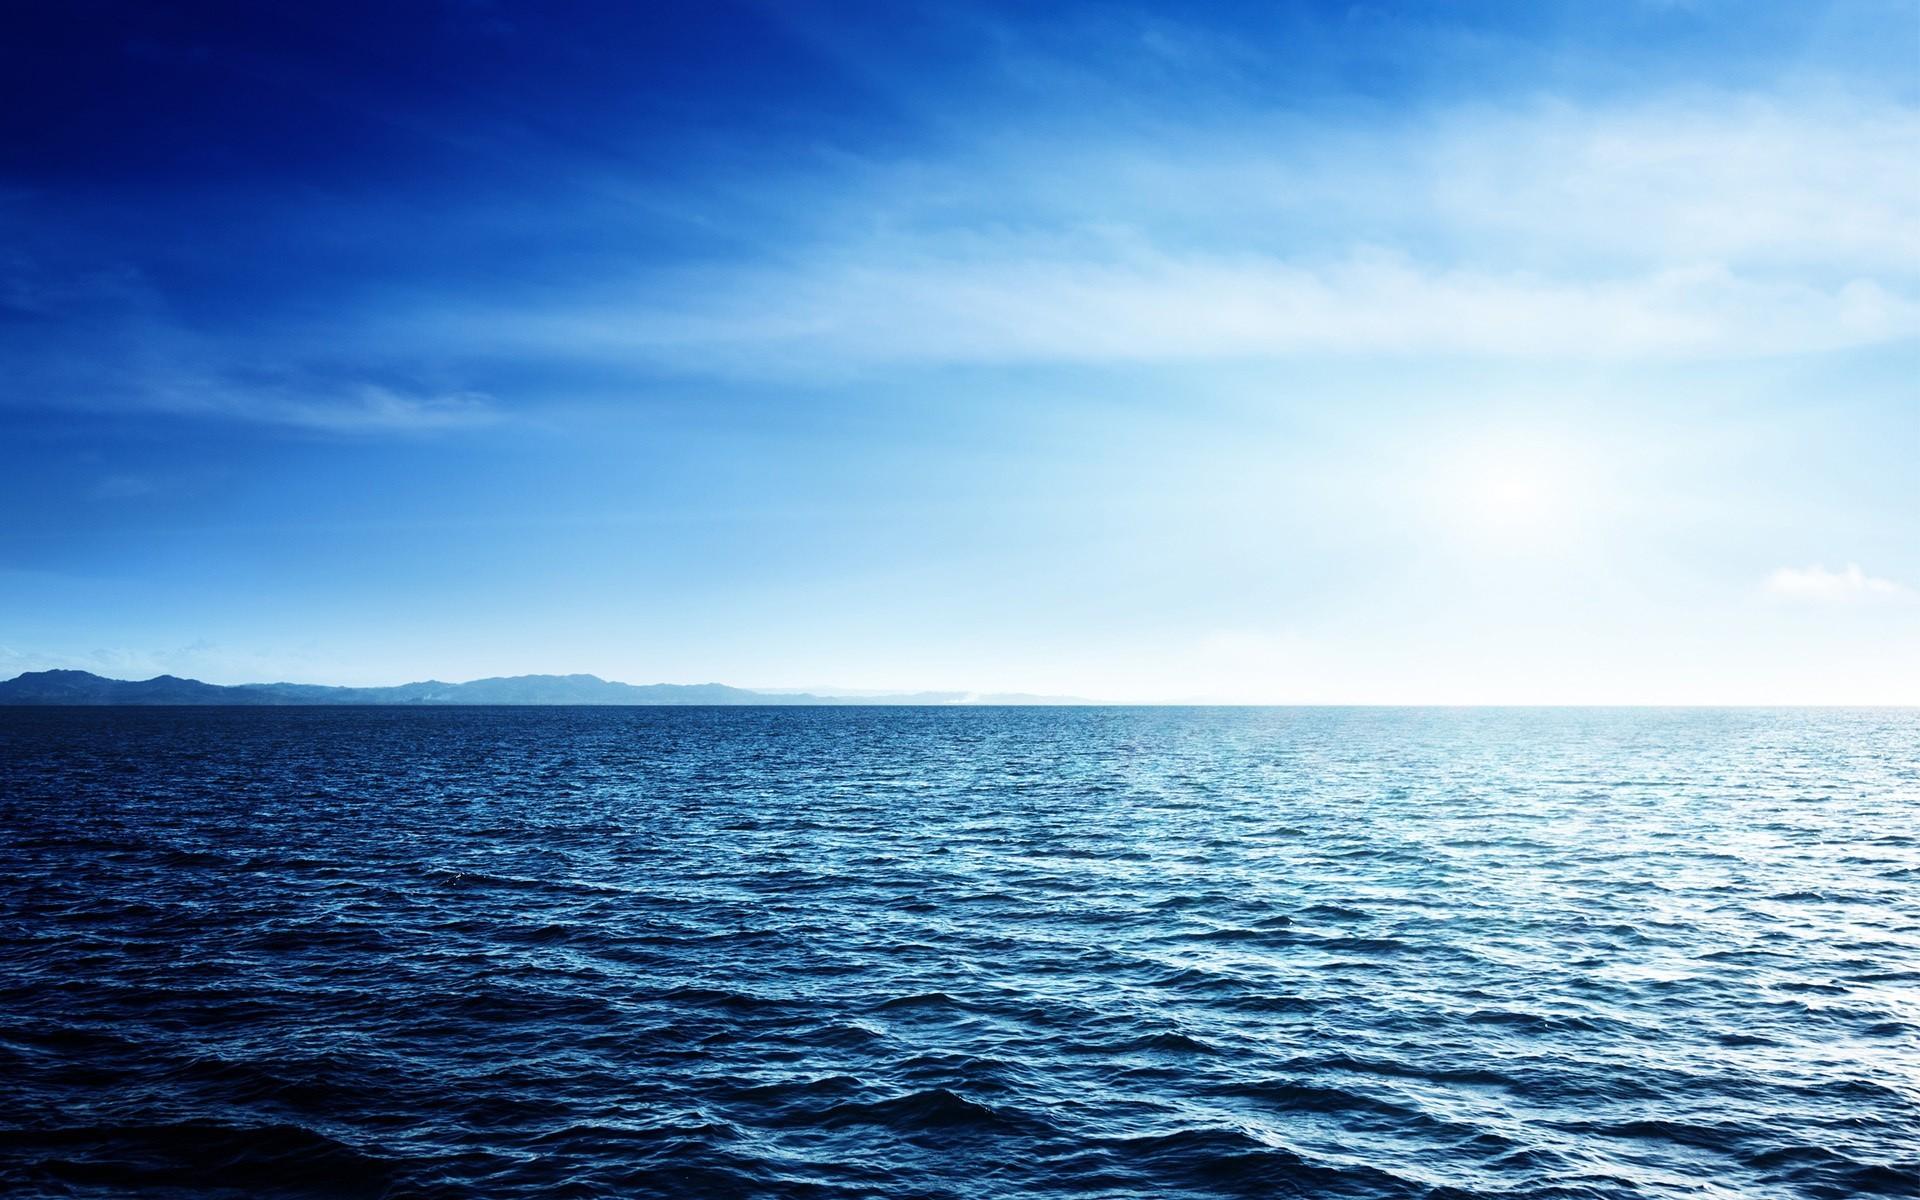 Wallpaper Ocean Scenes Free Wallpaper Ocean Scenes – Beautiful Ocean .